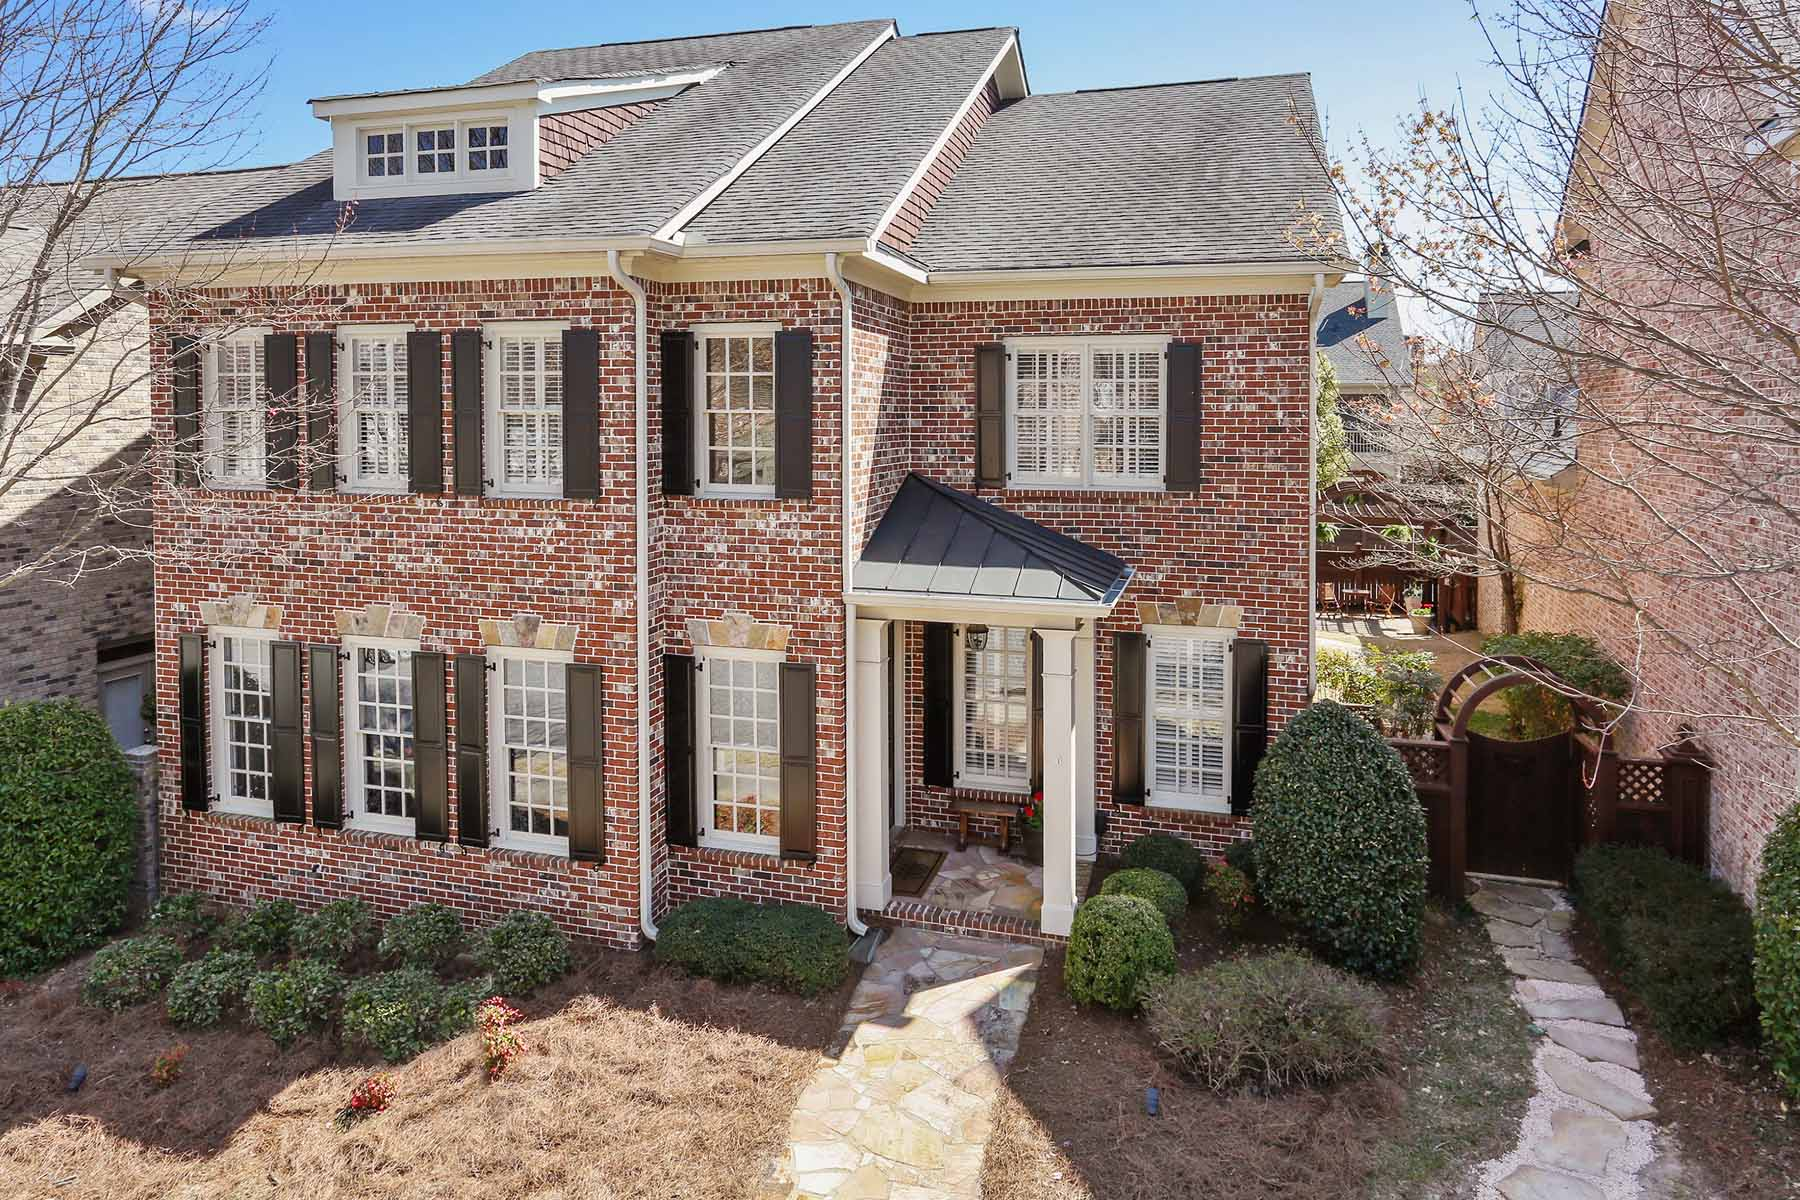 獨棟家庭住宅 為 出售 在 Easy Living, Amenity Rich, Close to Avalon 1065 Ambrose Avenue Alpharetta, 喬治亞州, 30022 美國